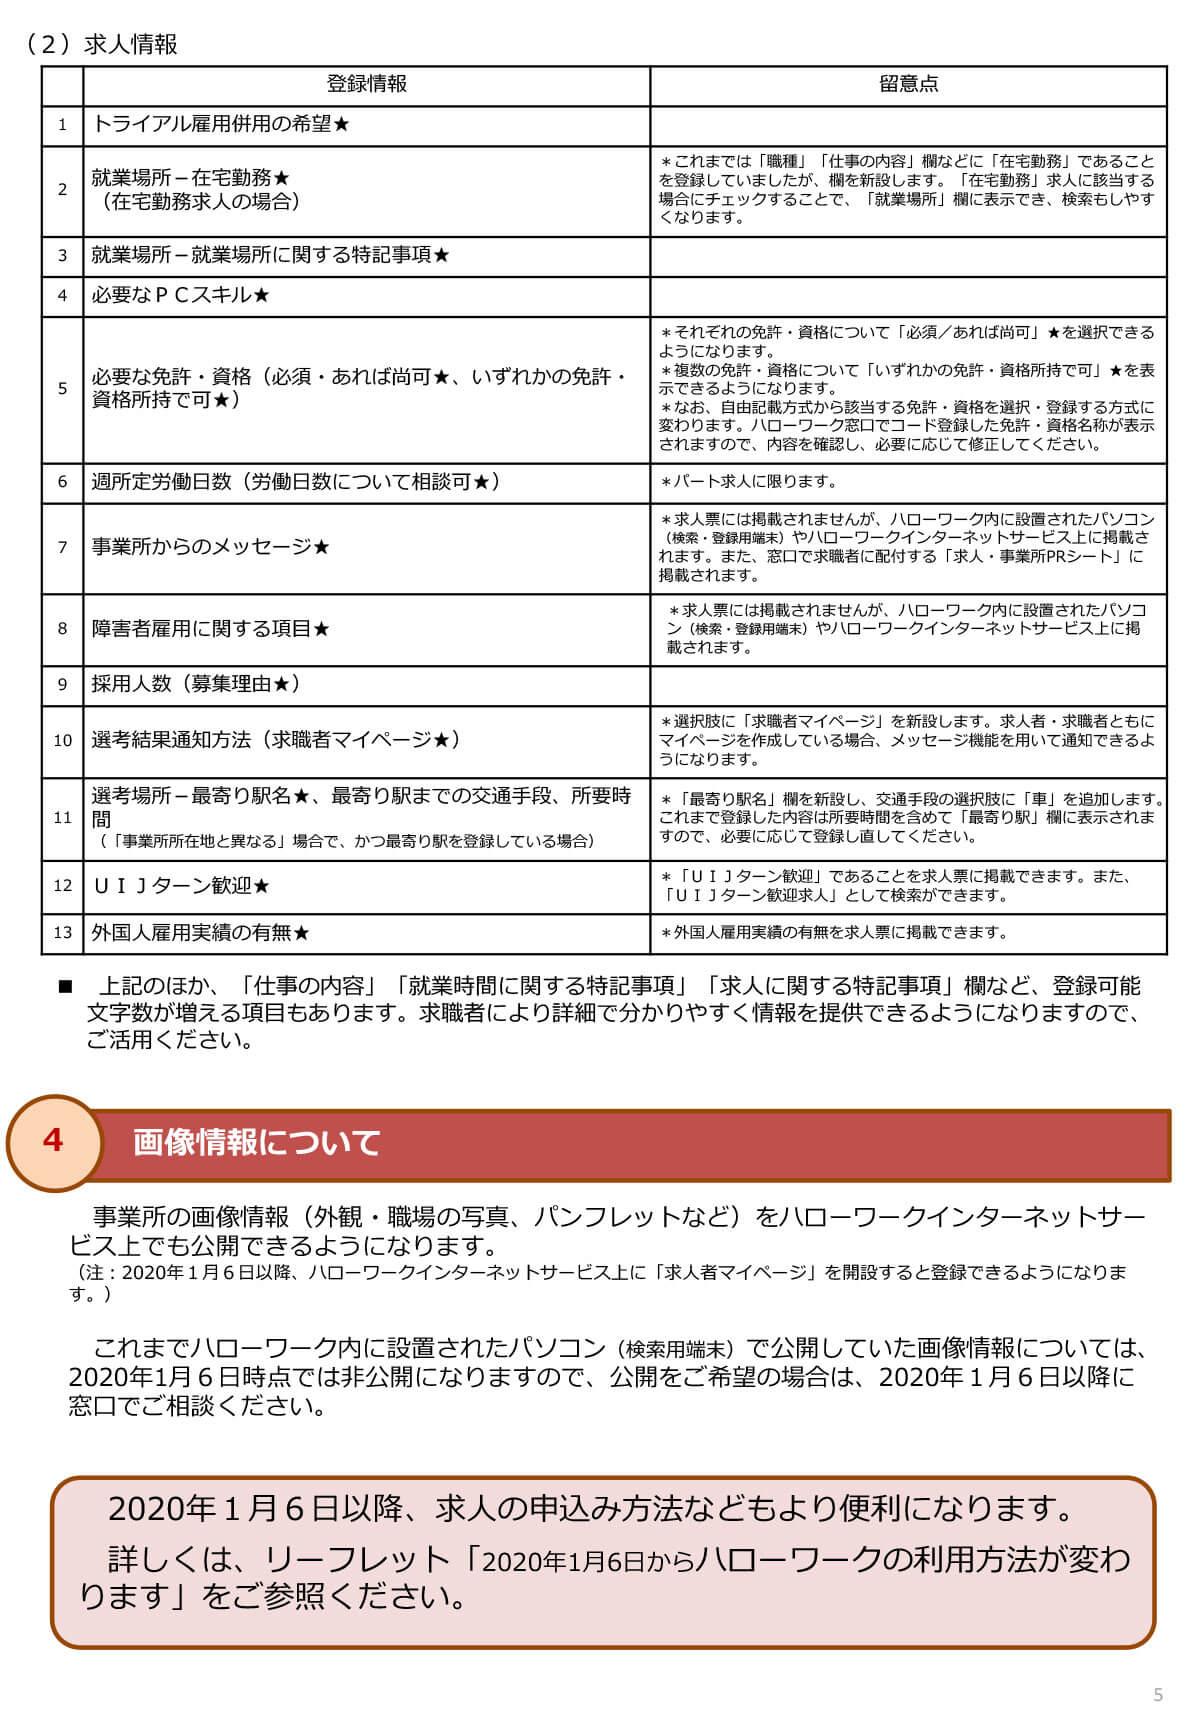 20200106-5-job_posting-2-5